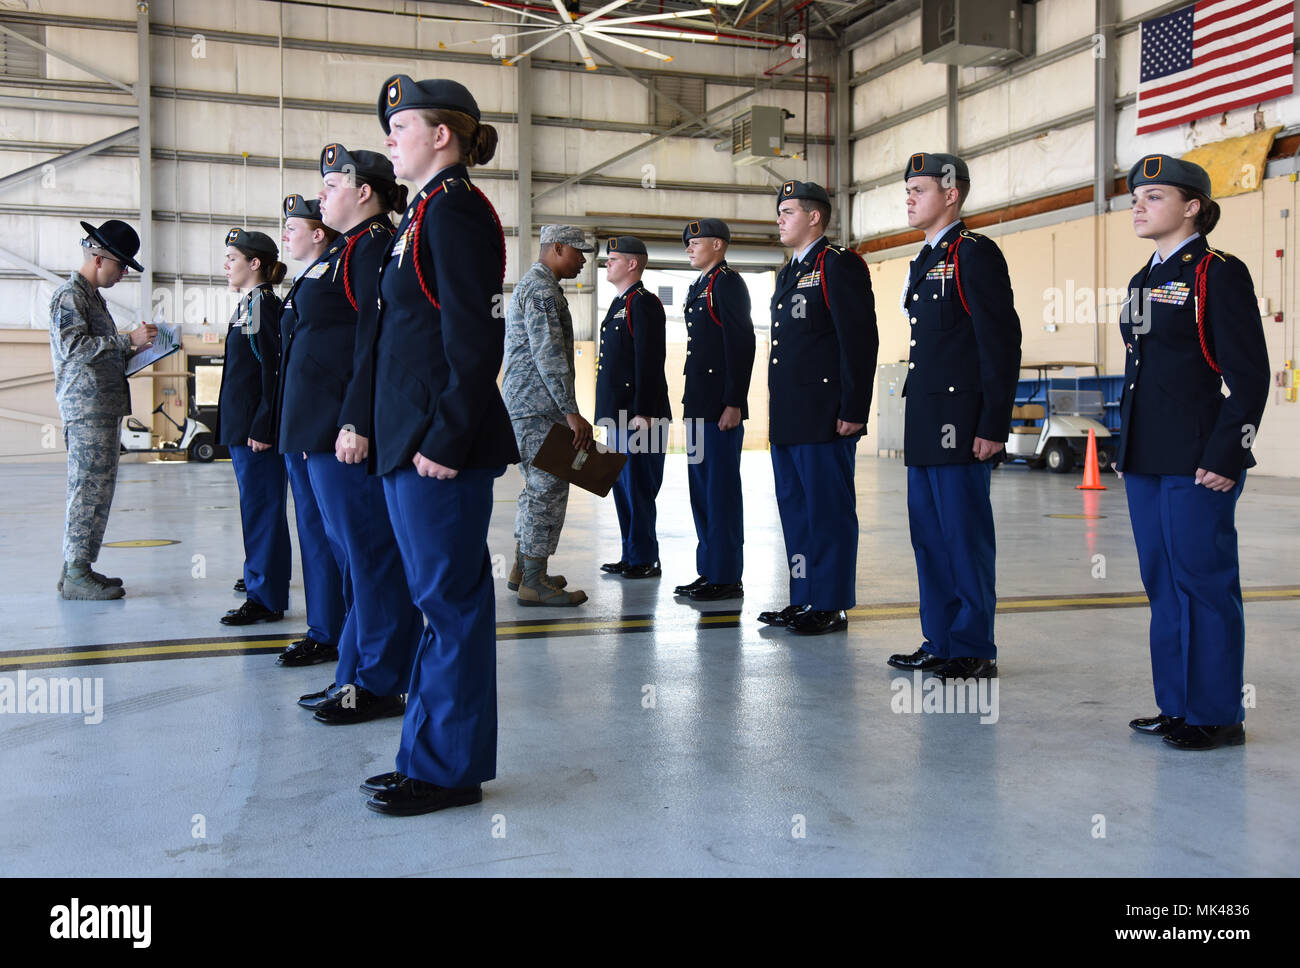 338th Squadron Stock Photos & 338th Squadron Stock Images - Alamy